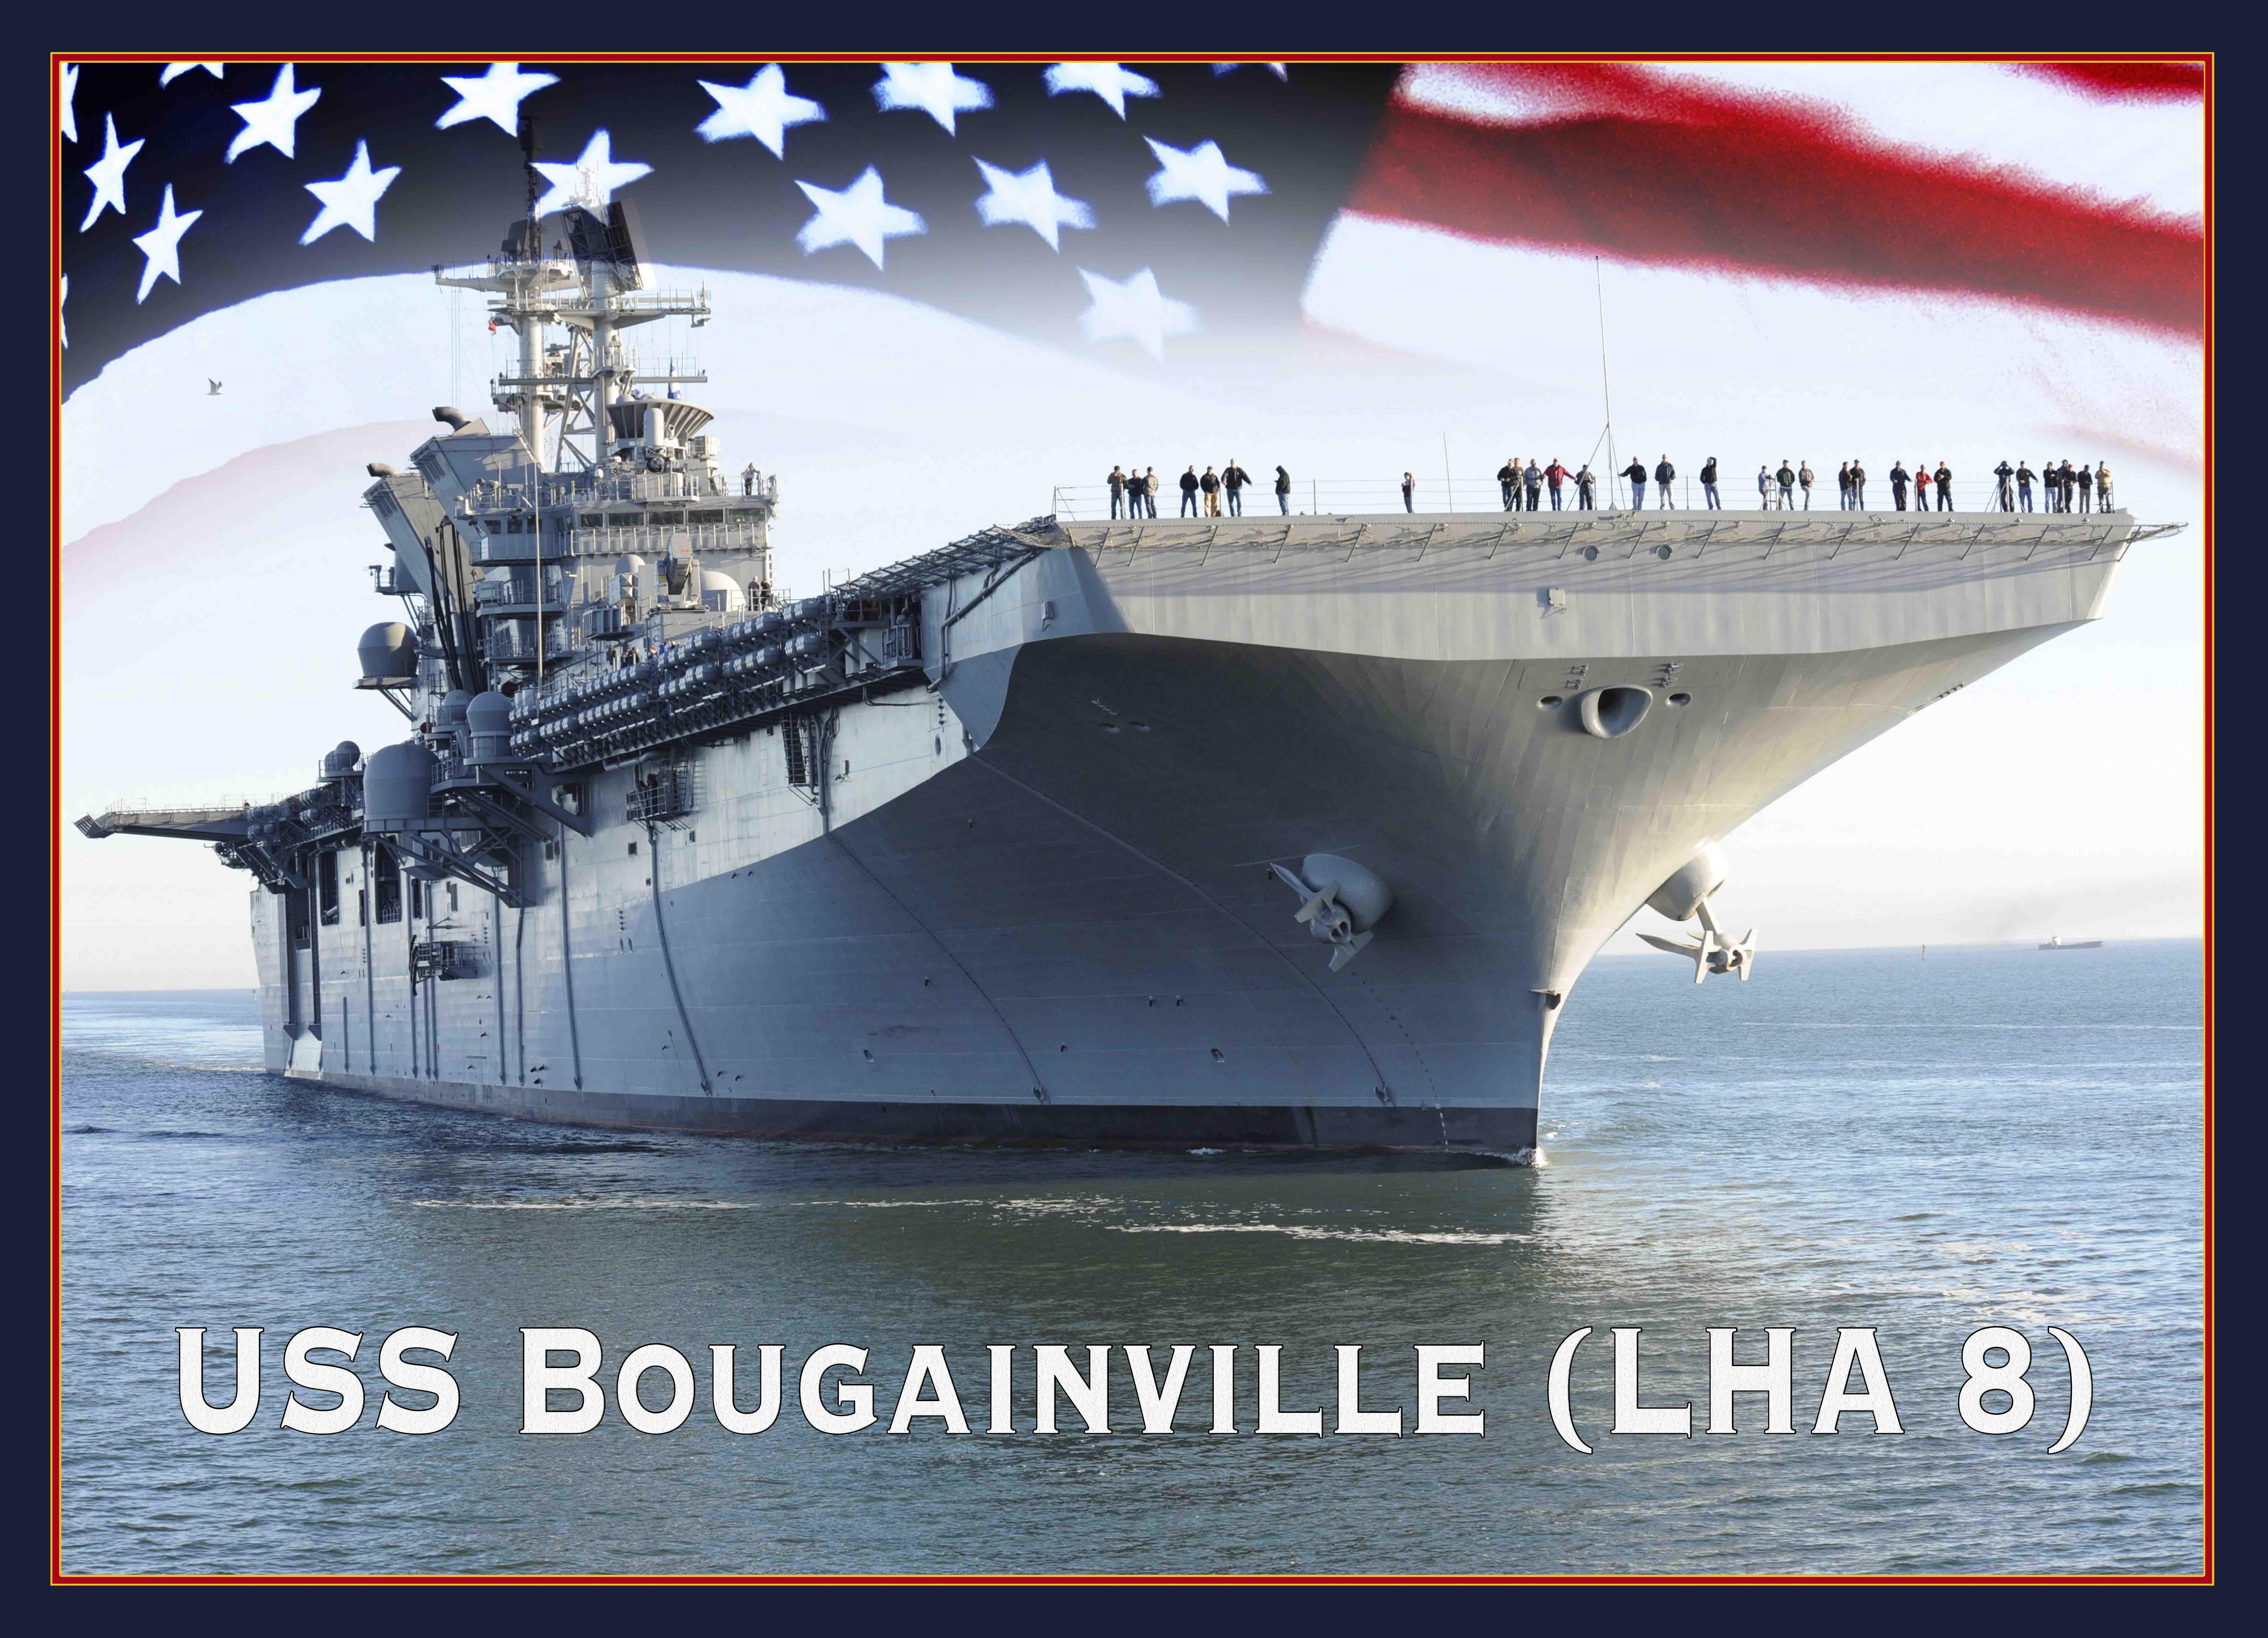 USS BOUGAINVILLE LHA-8 Grafik: U.S. Navy